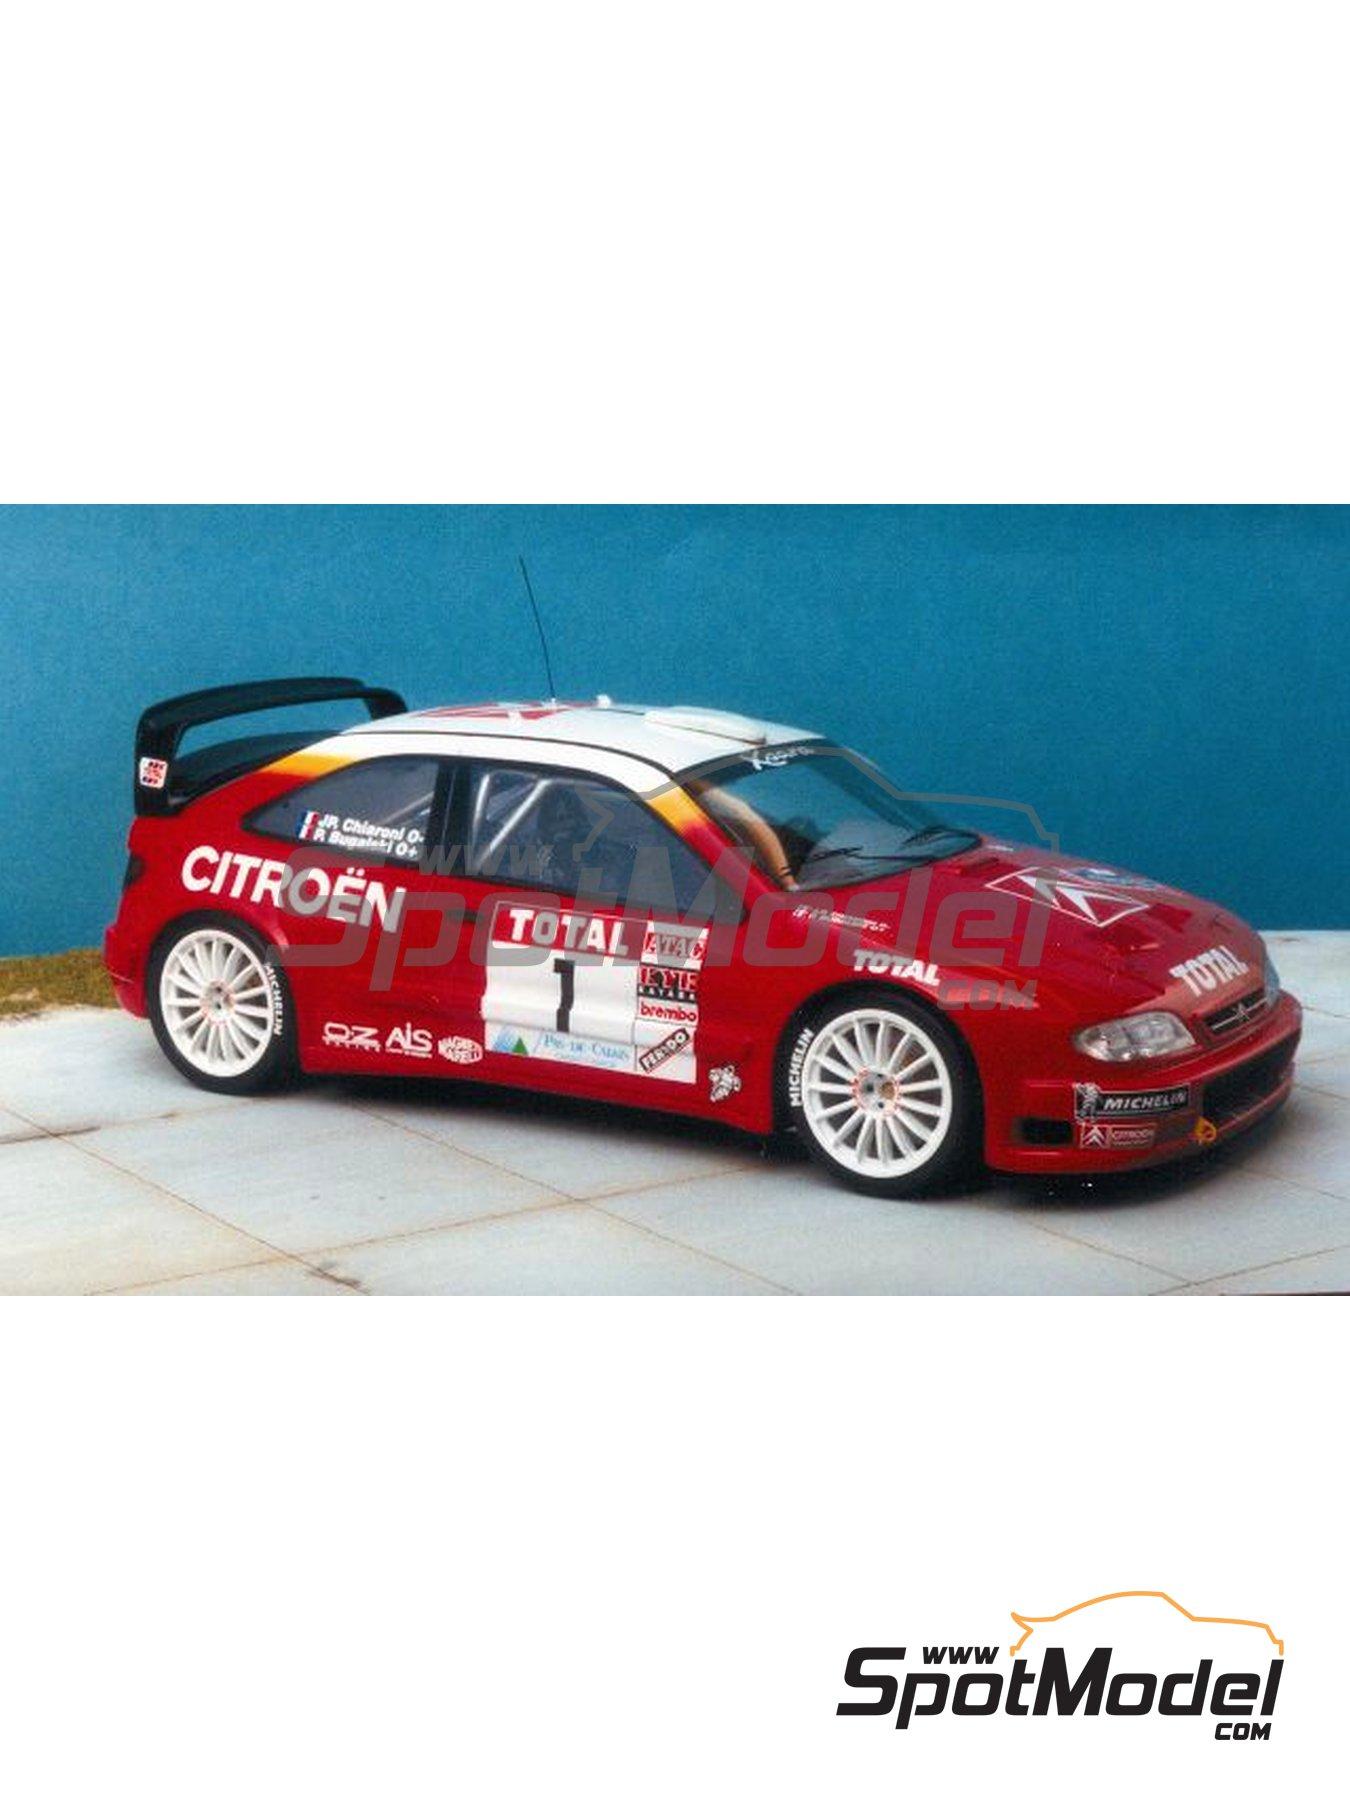 Citroen Xsara T4 WRC -  2000 | Model car kit in 1/24 scale manufactured by Renaissance Models (ref.CTR2409) image